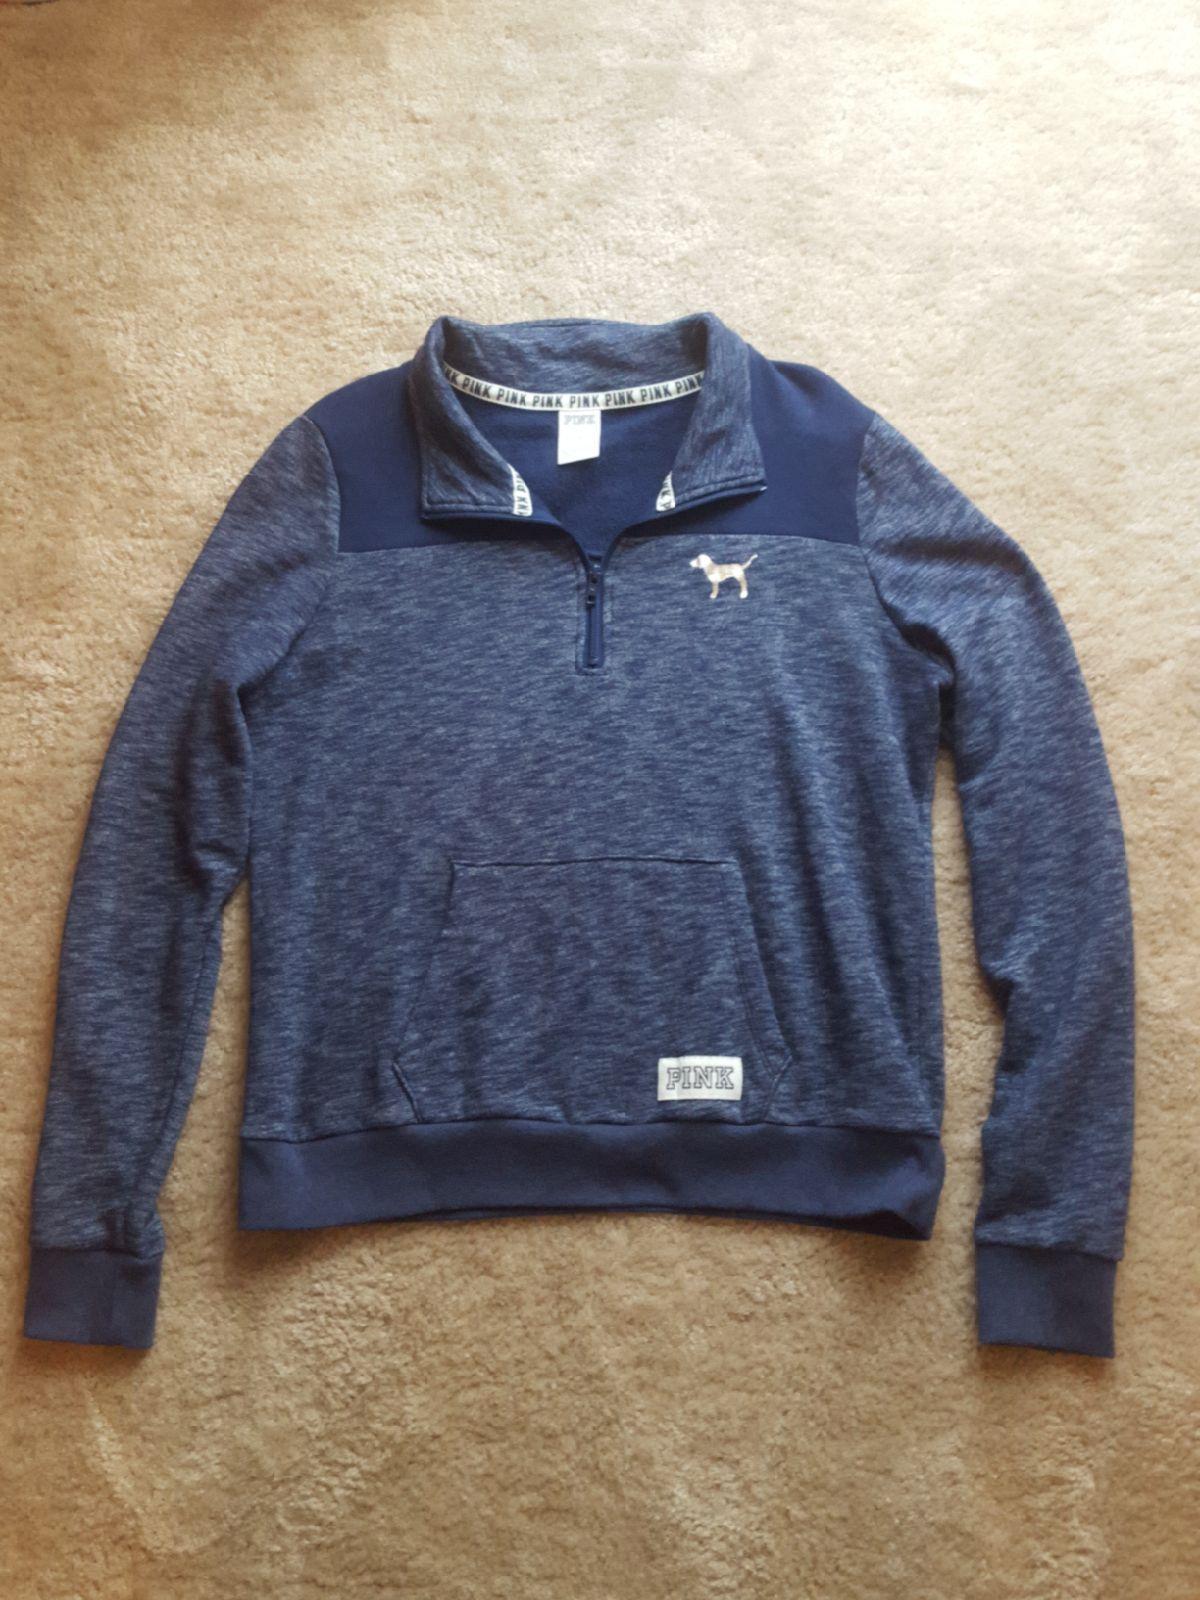 Victoria secret Pink Quarter Zip sweater - Mercari: BUY & SELL ...